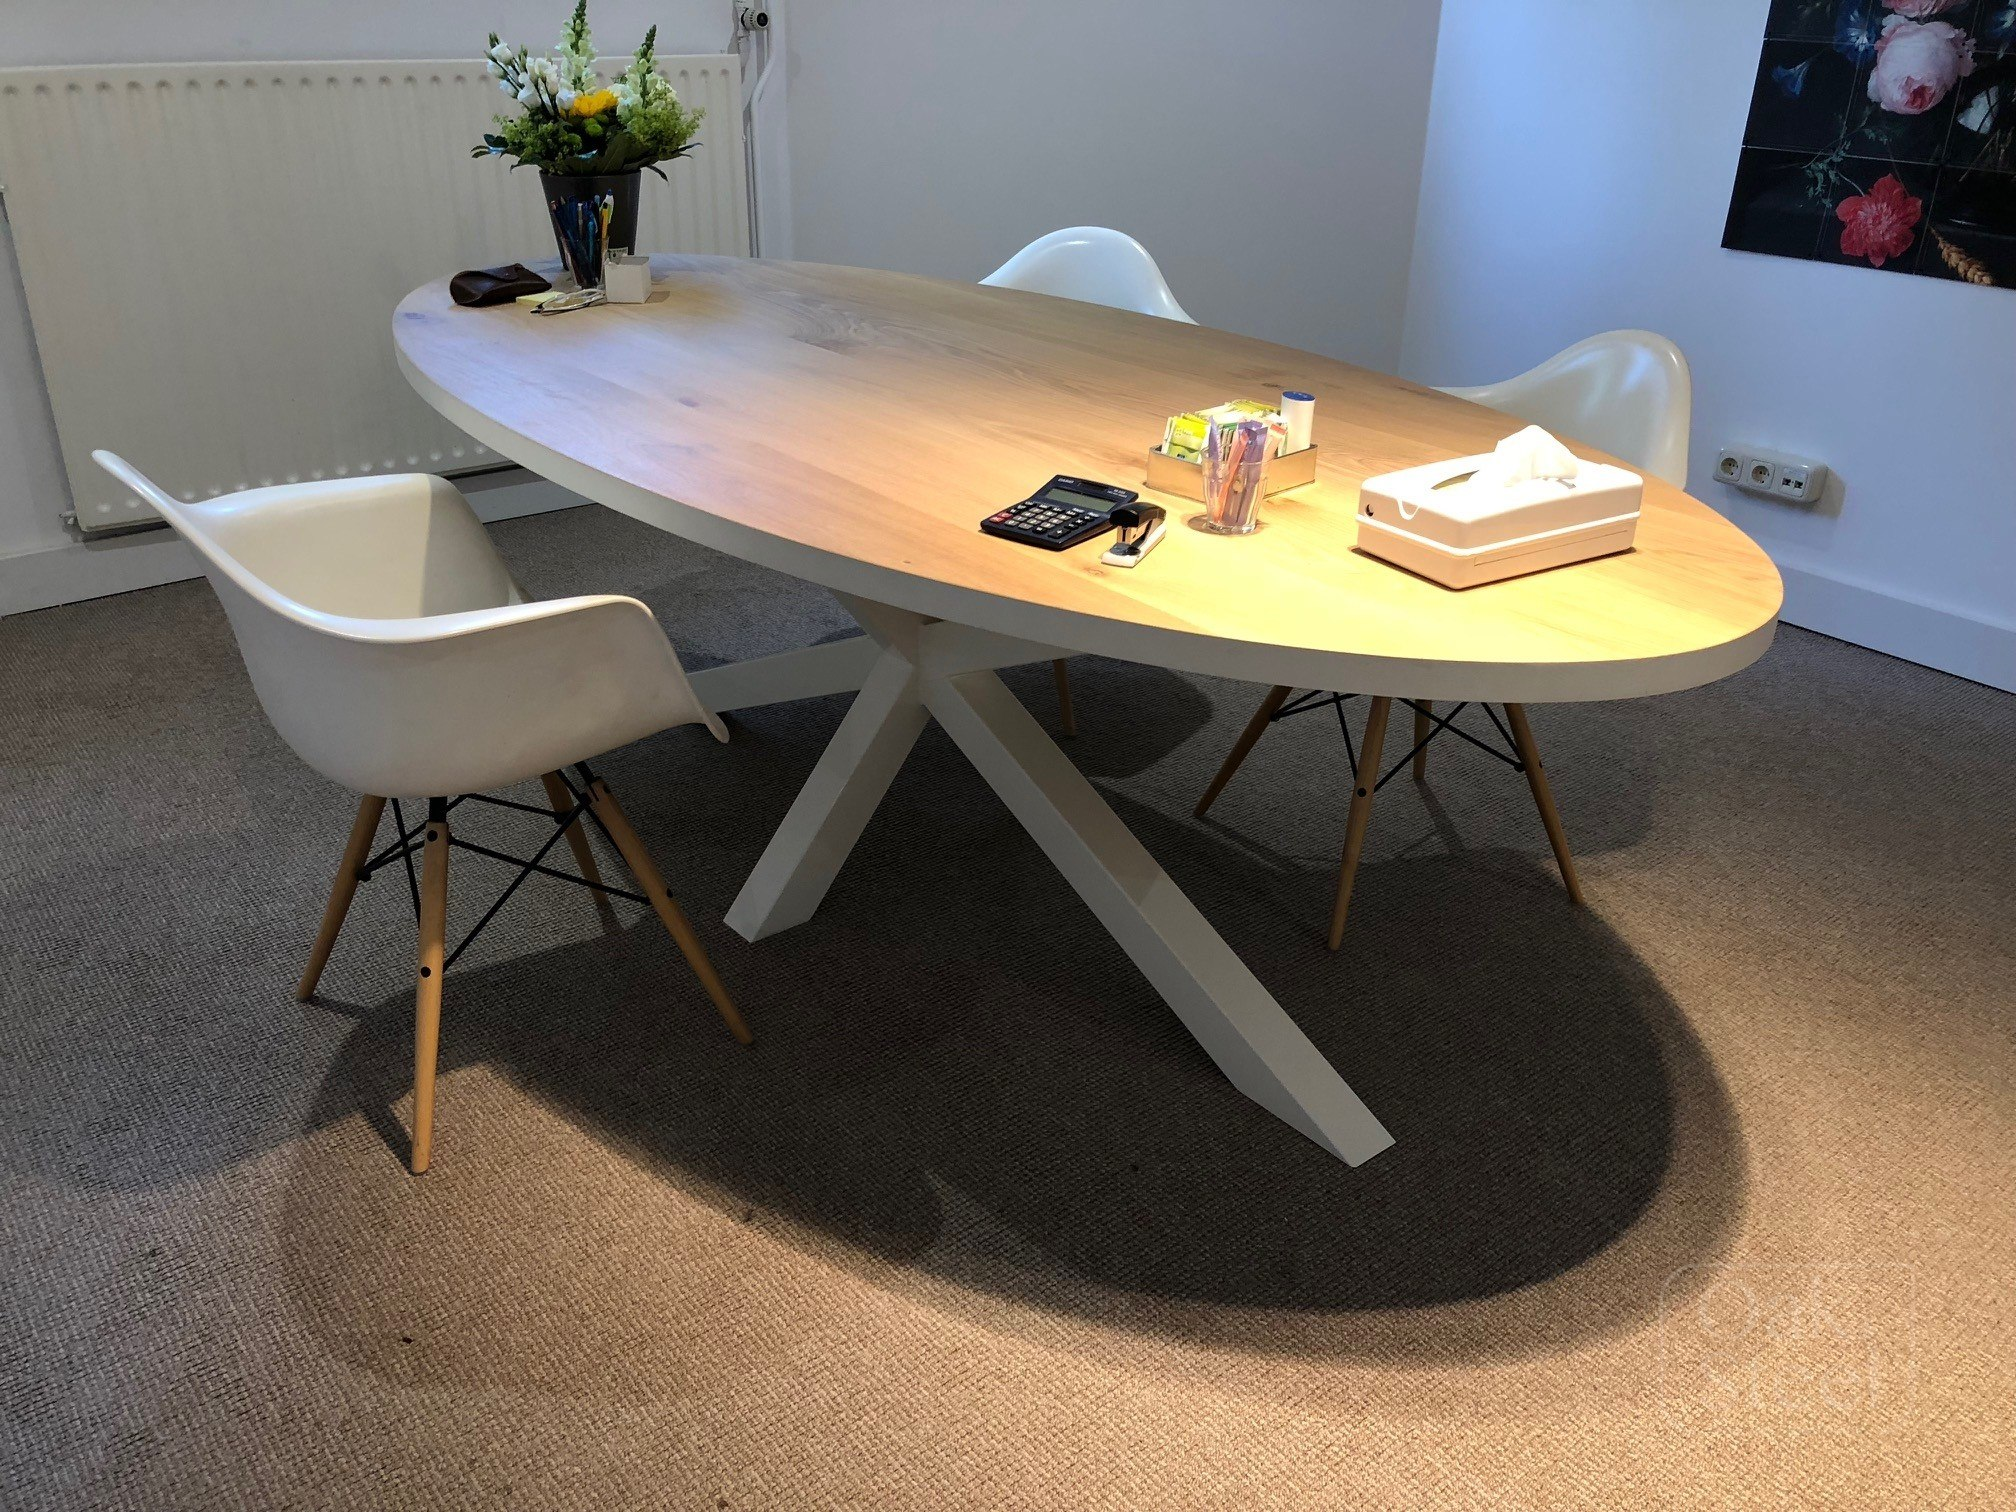 Ovale eiken tafel met wit gelakte rand